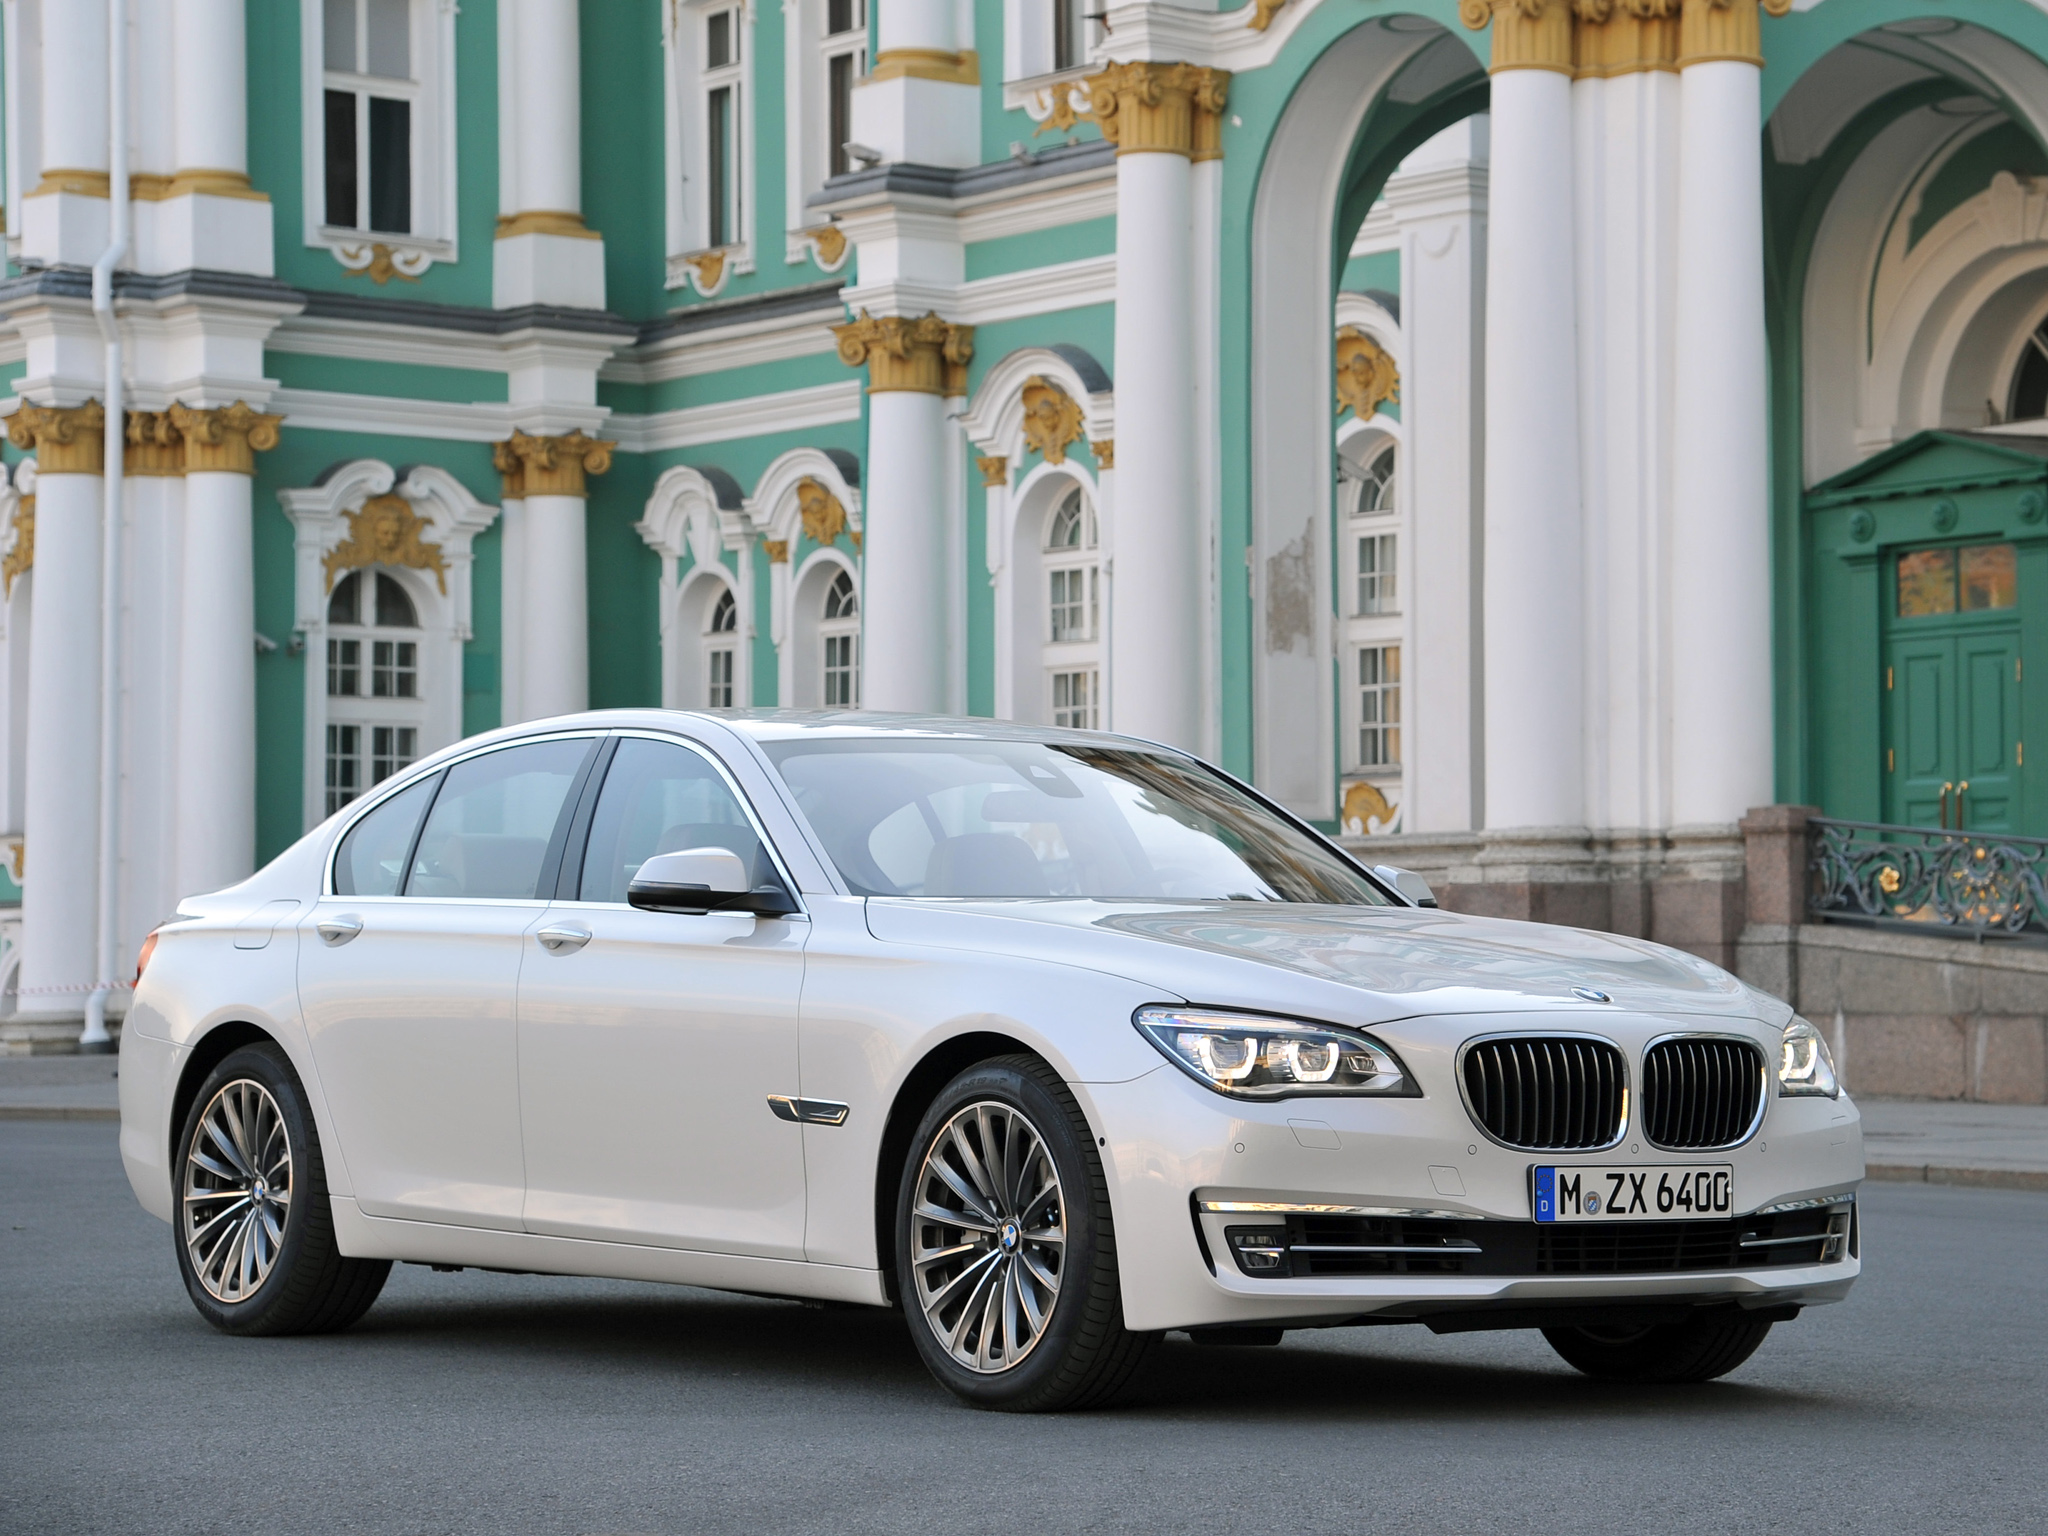 BMW 7 Serie (F01) 2008 - heden